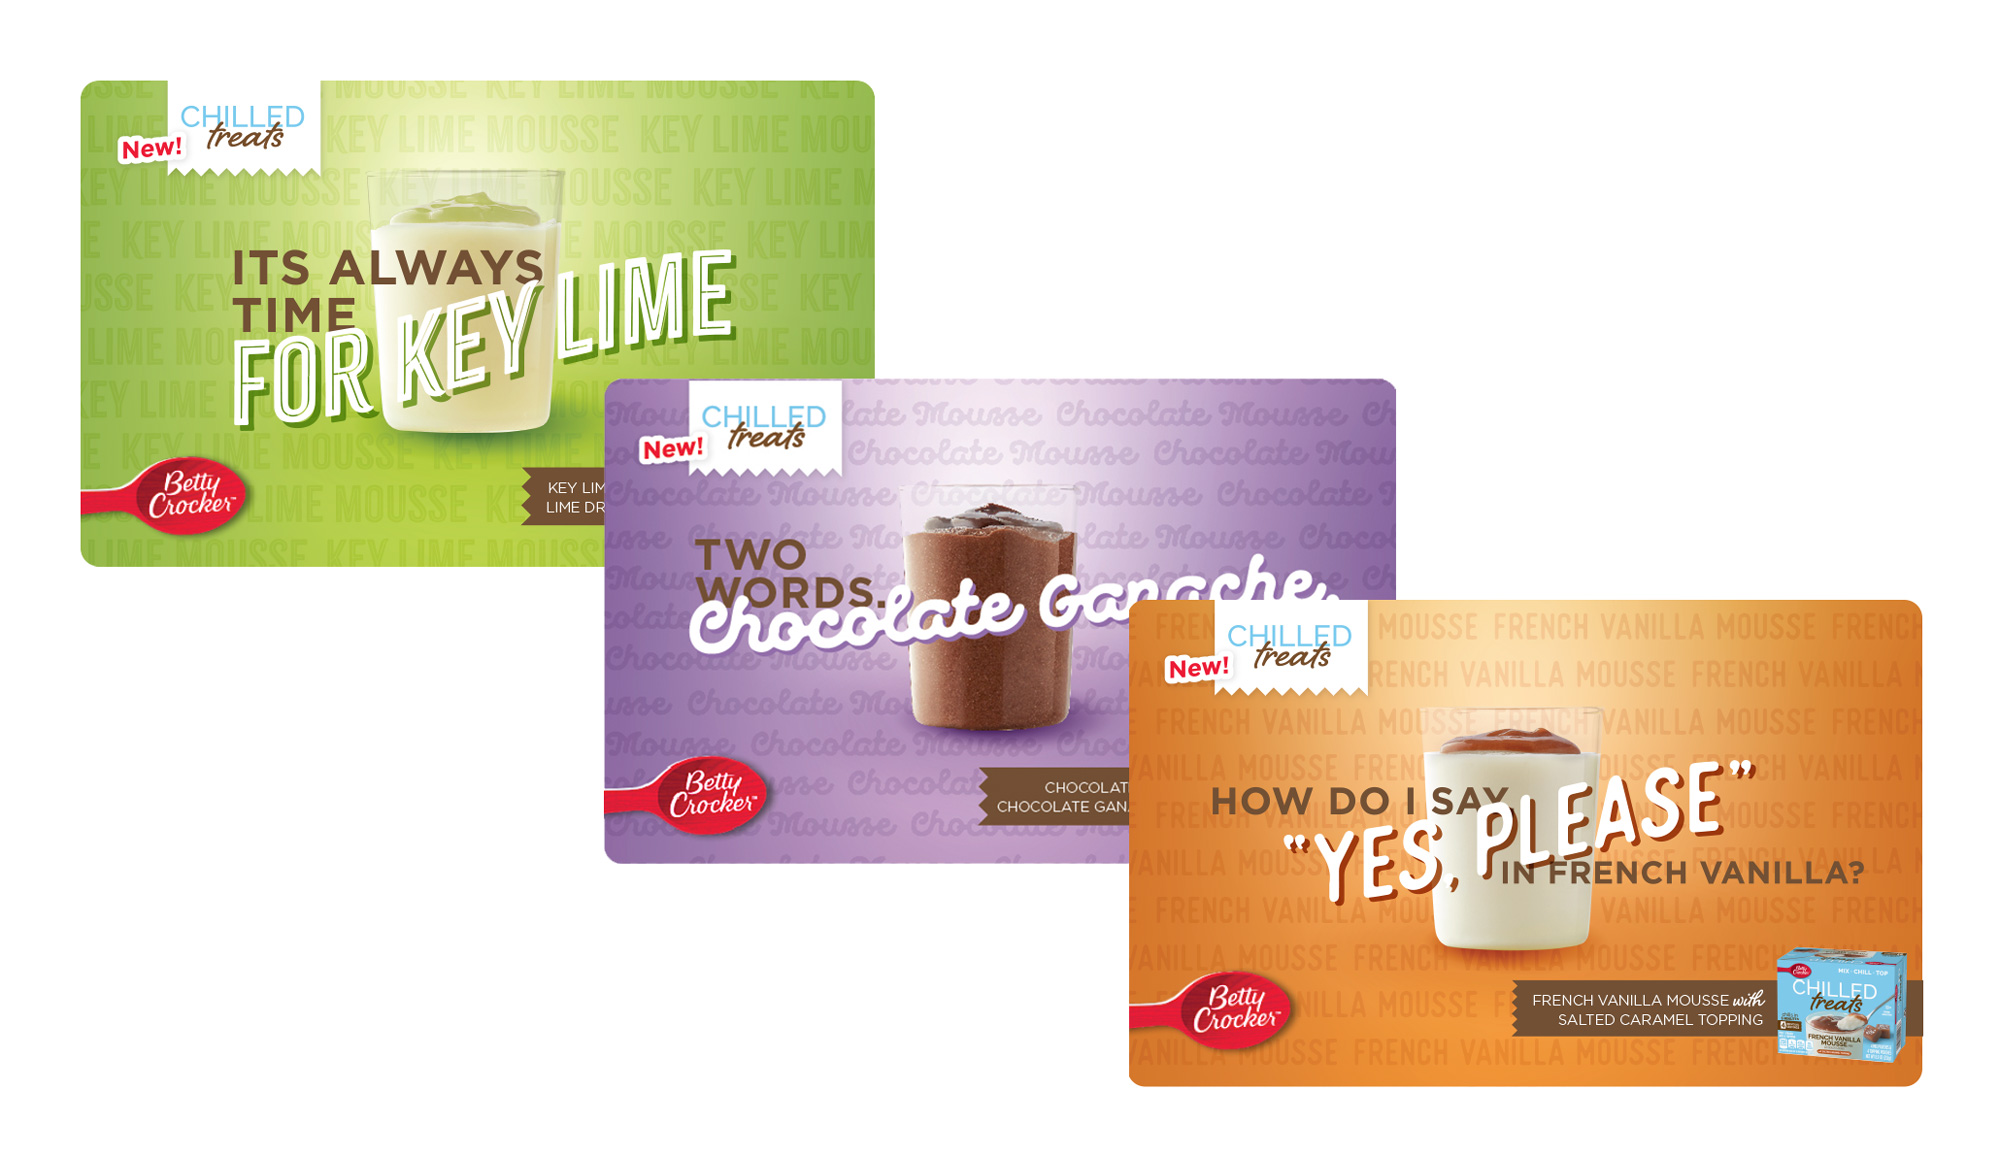 BC-ChilledTreats_Flavor-Themes.jpg